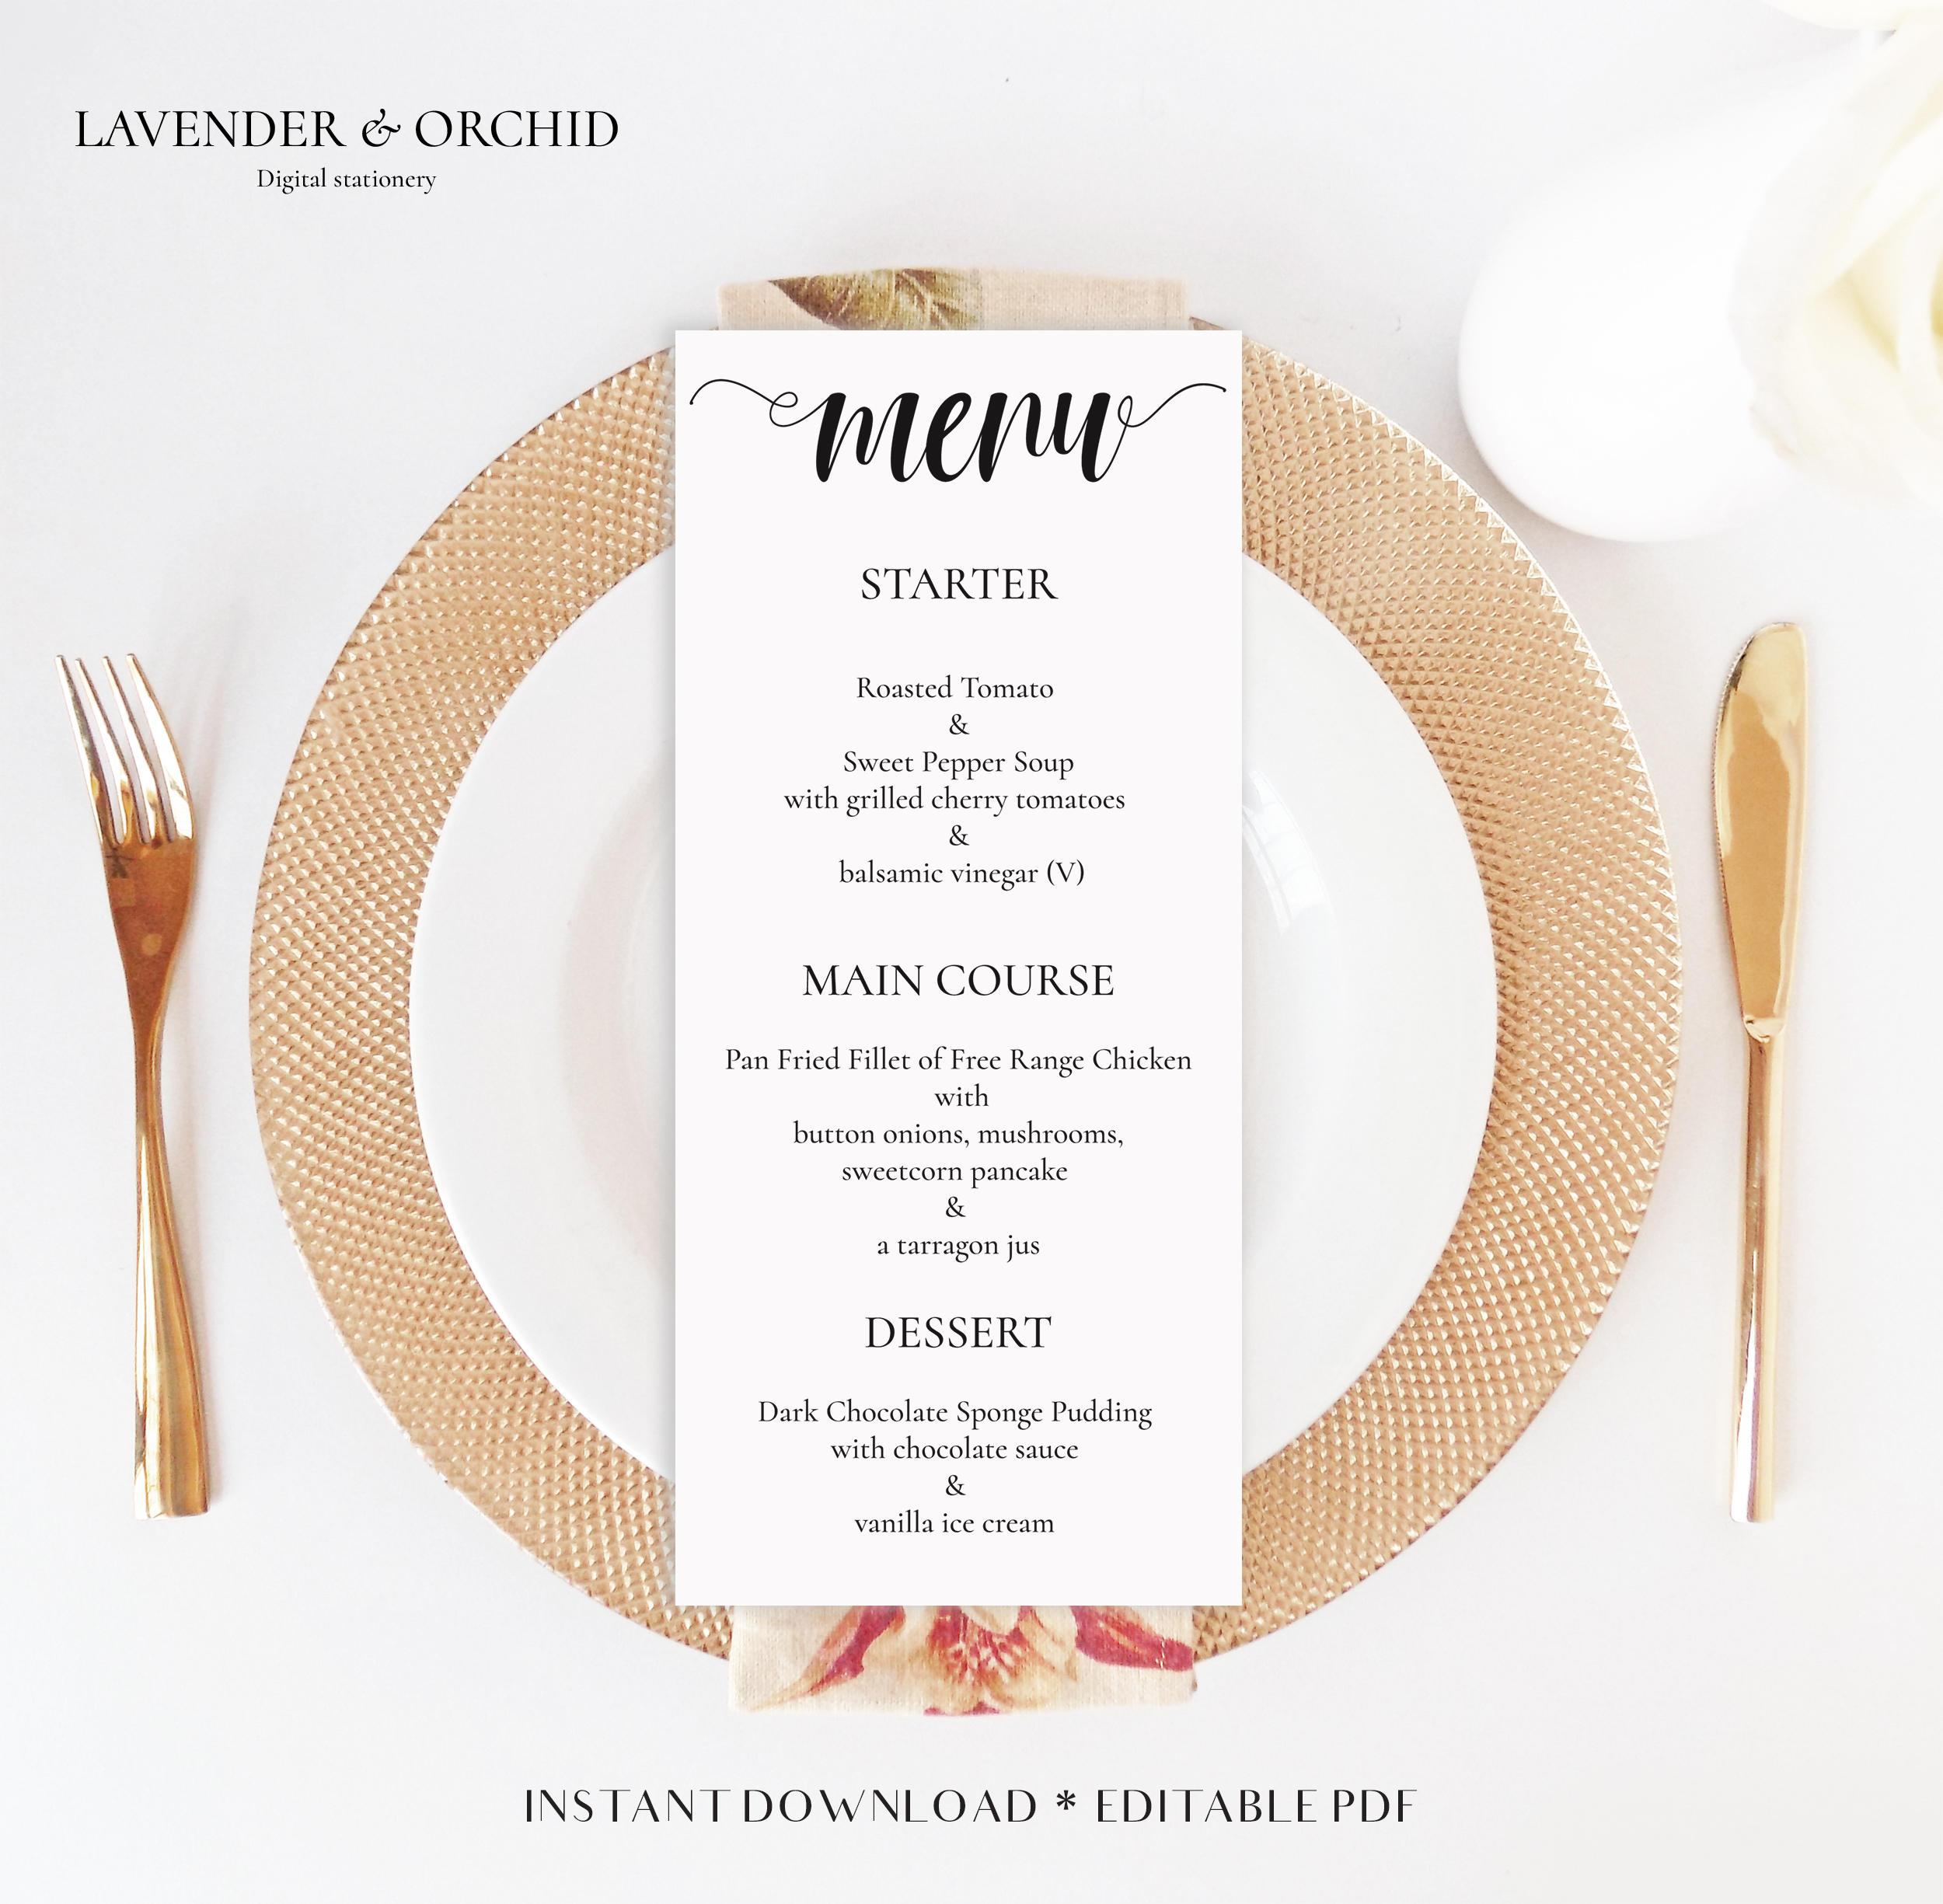 Wedding menu templates Dinner menu templates Instant download Editable PDF DIY dinner menu Party menu templateDinner menu Menu card